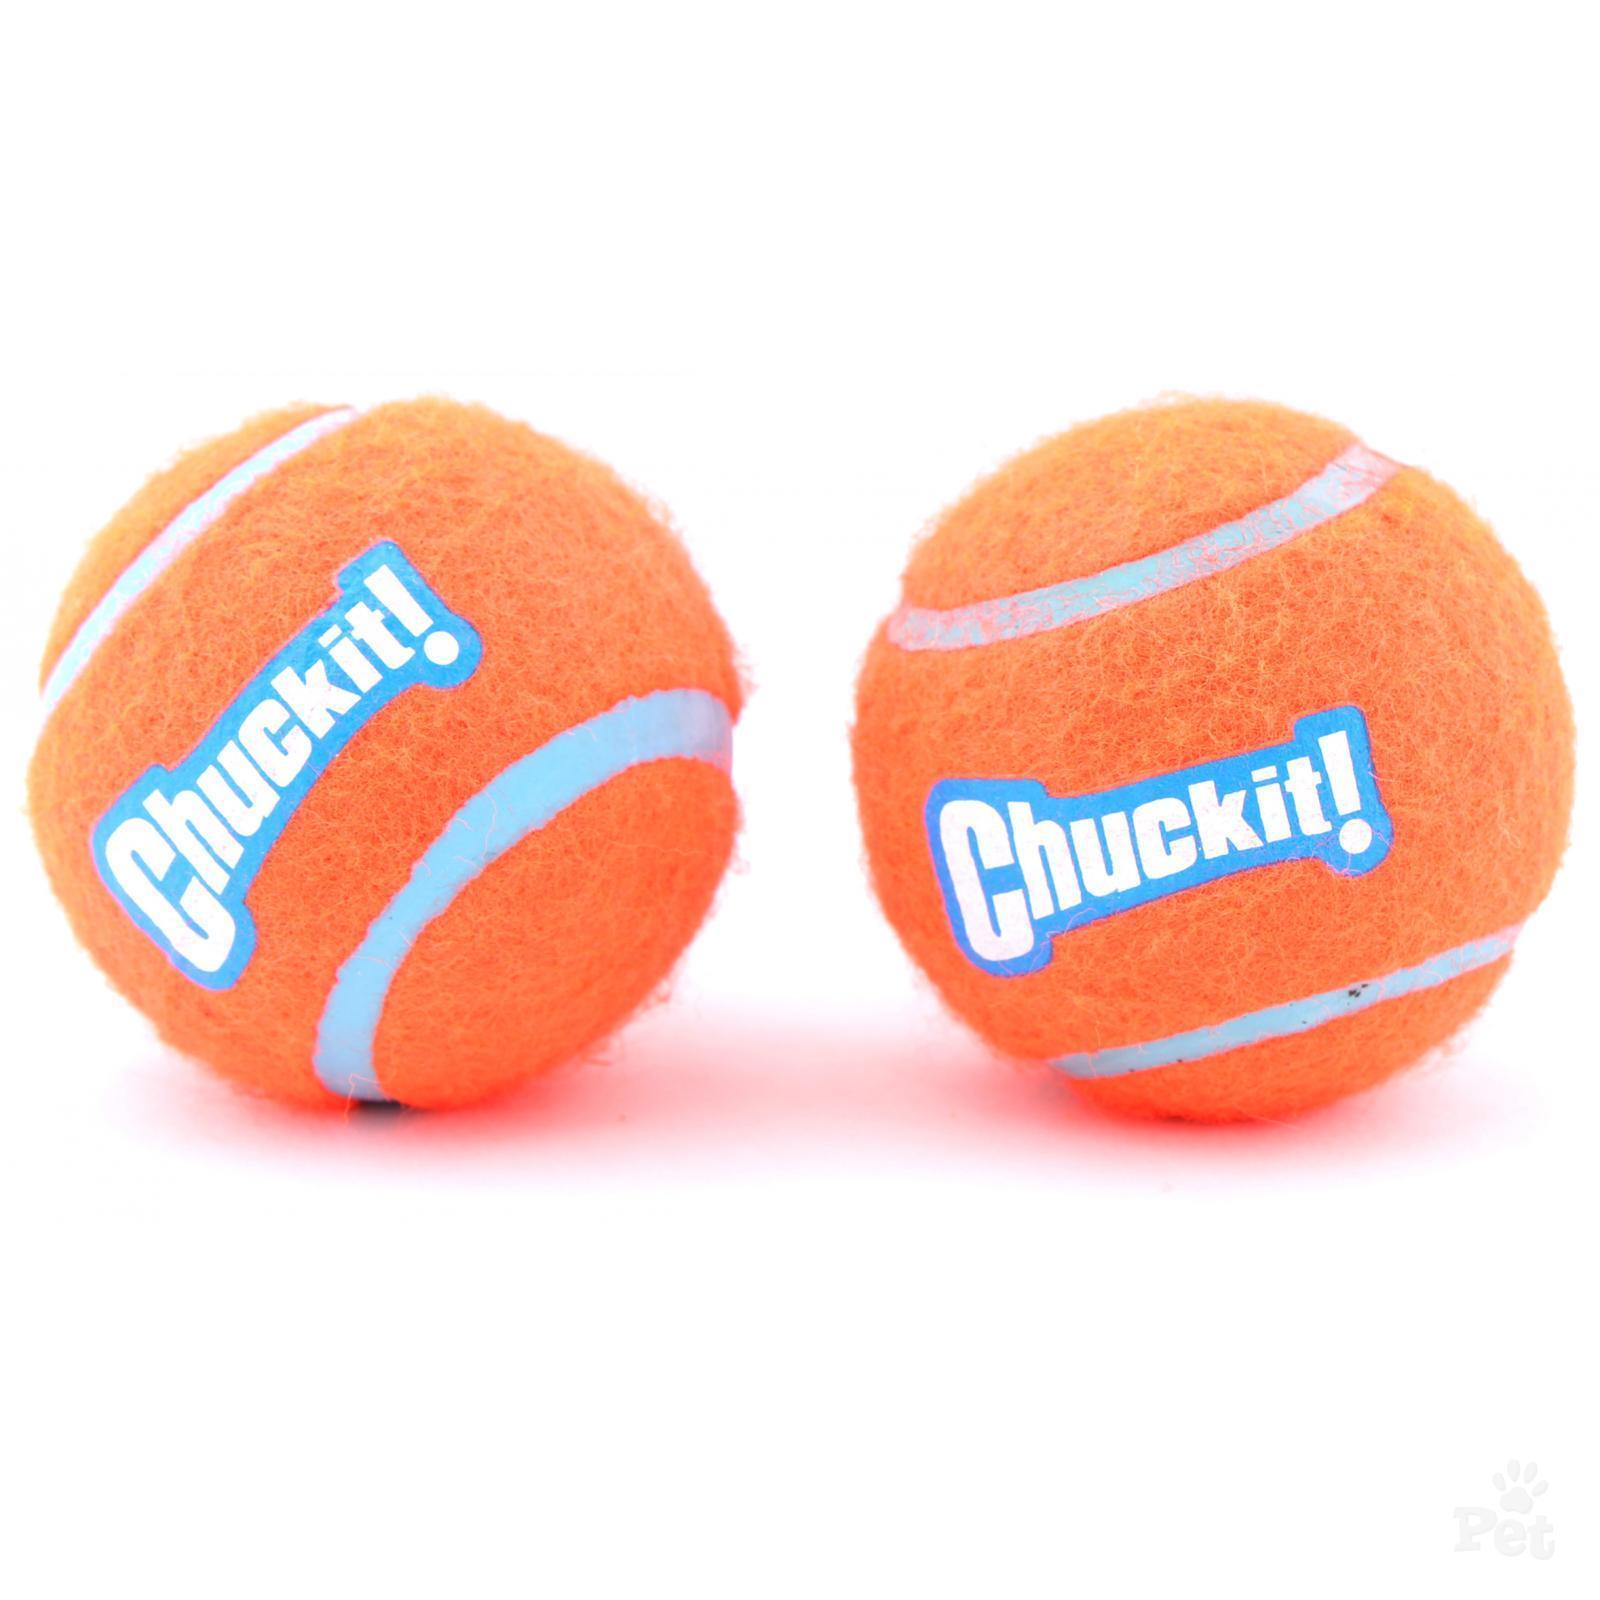 1600x1600 Chuckit Small Tennis Ball